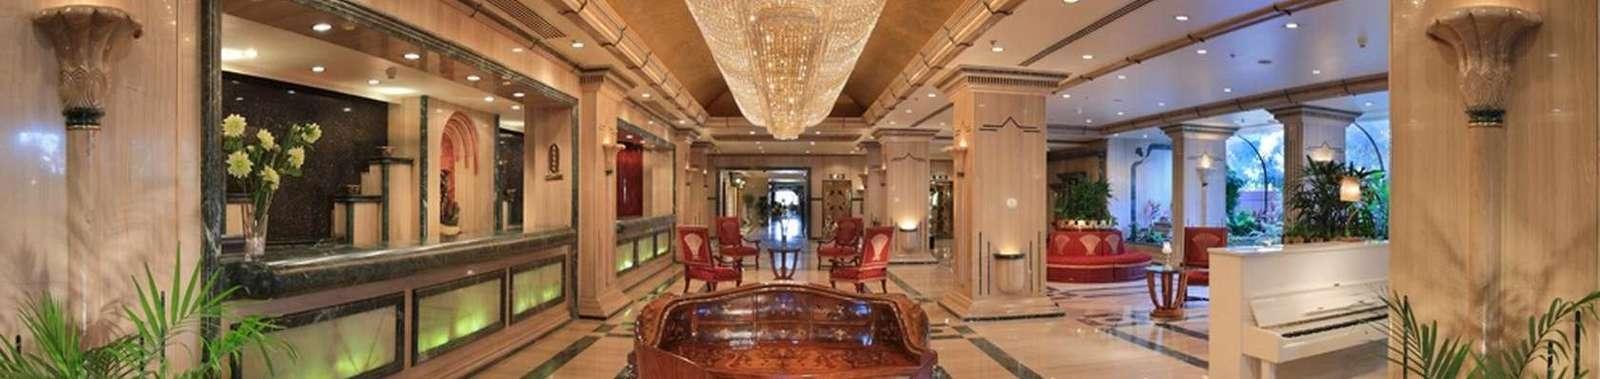 Sonesta_St_George_Hotel_lobby